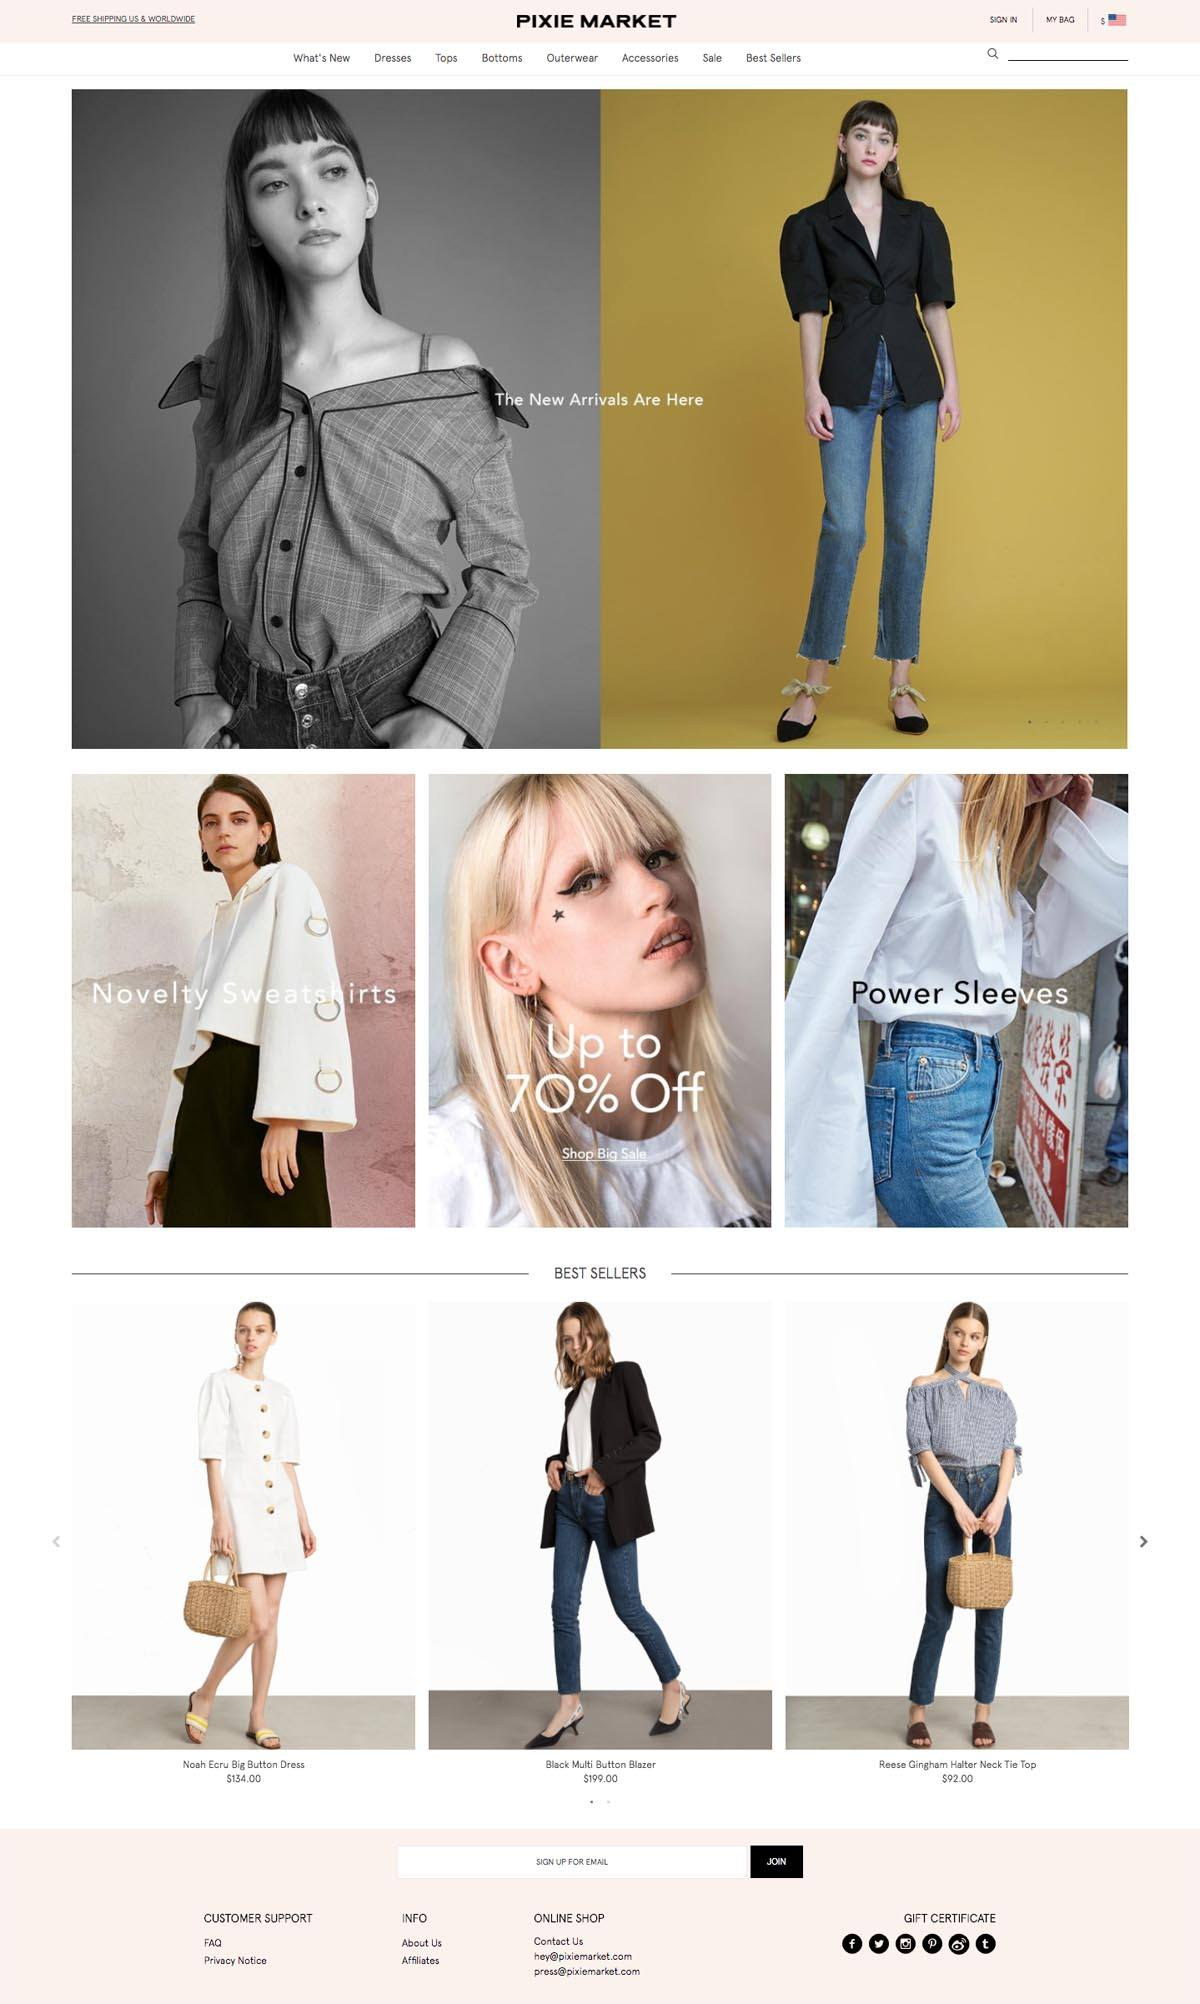 eCommerce website: Pixie Market